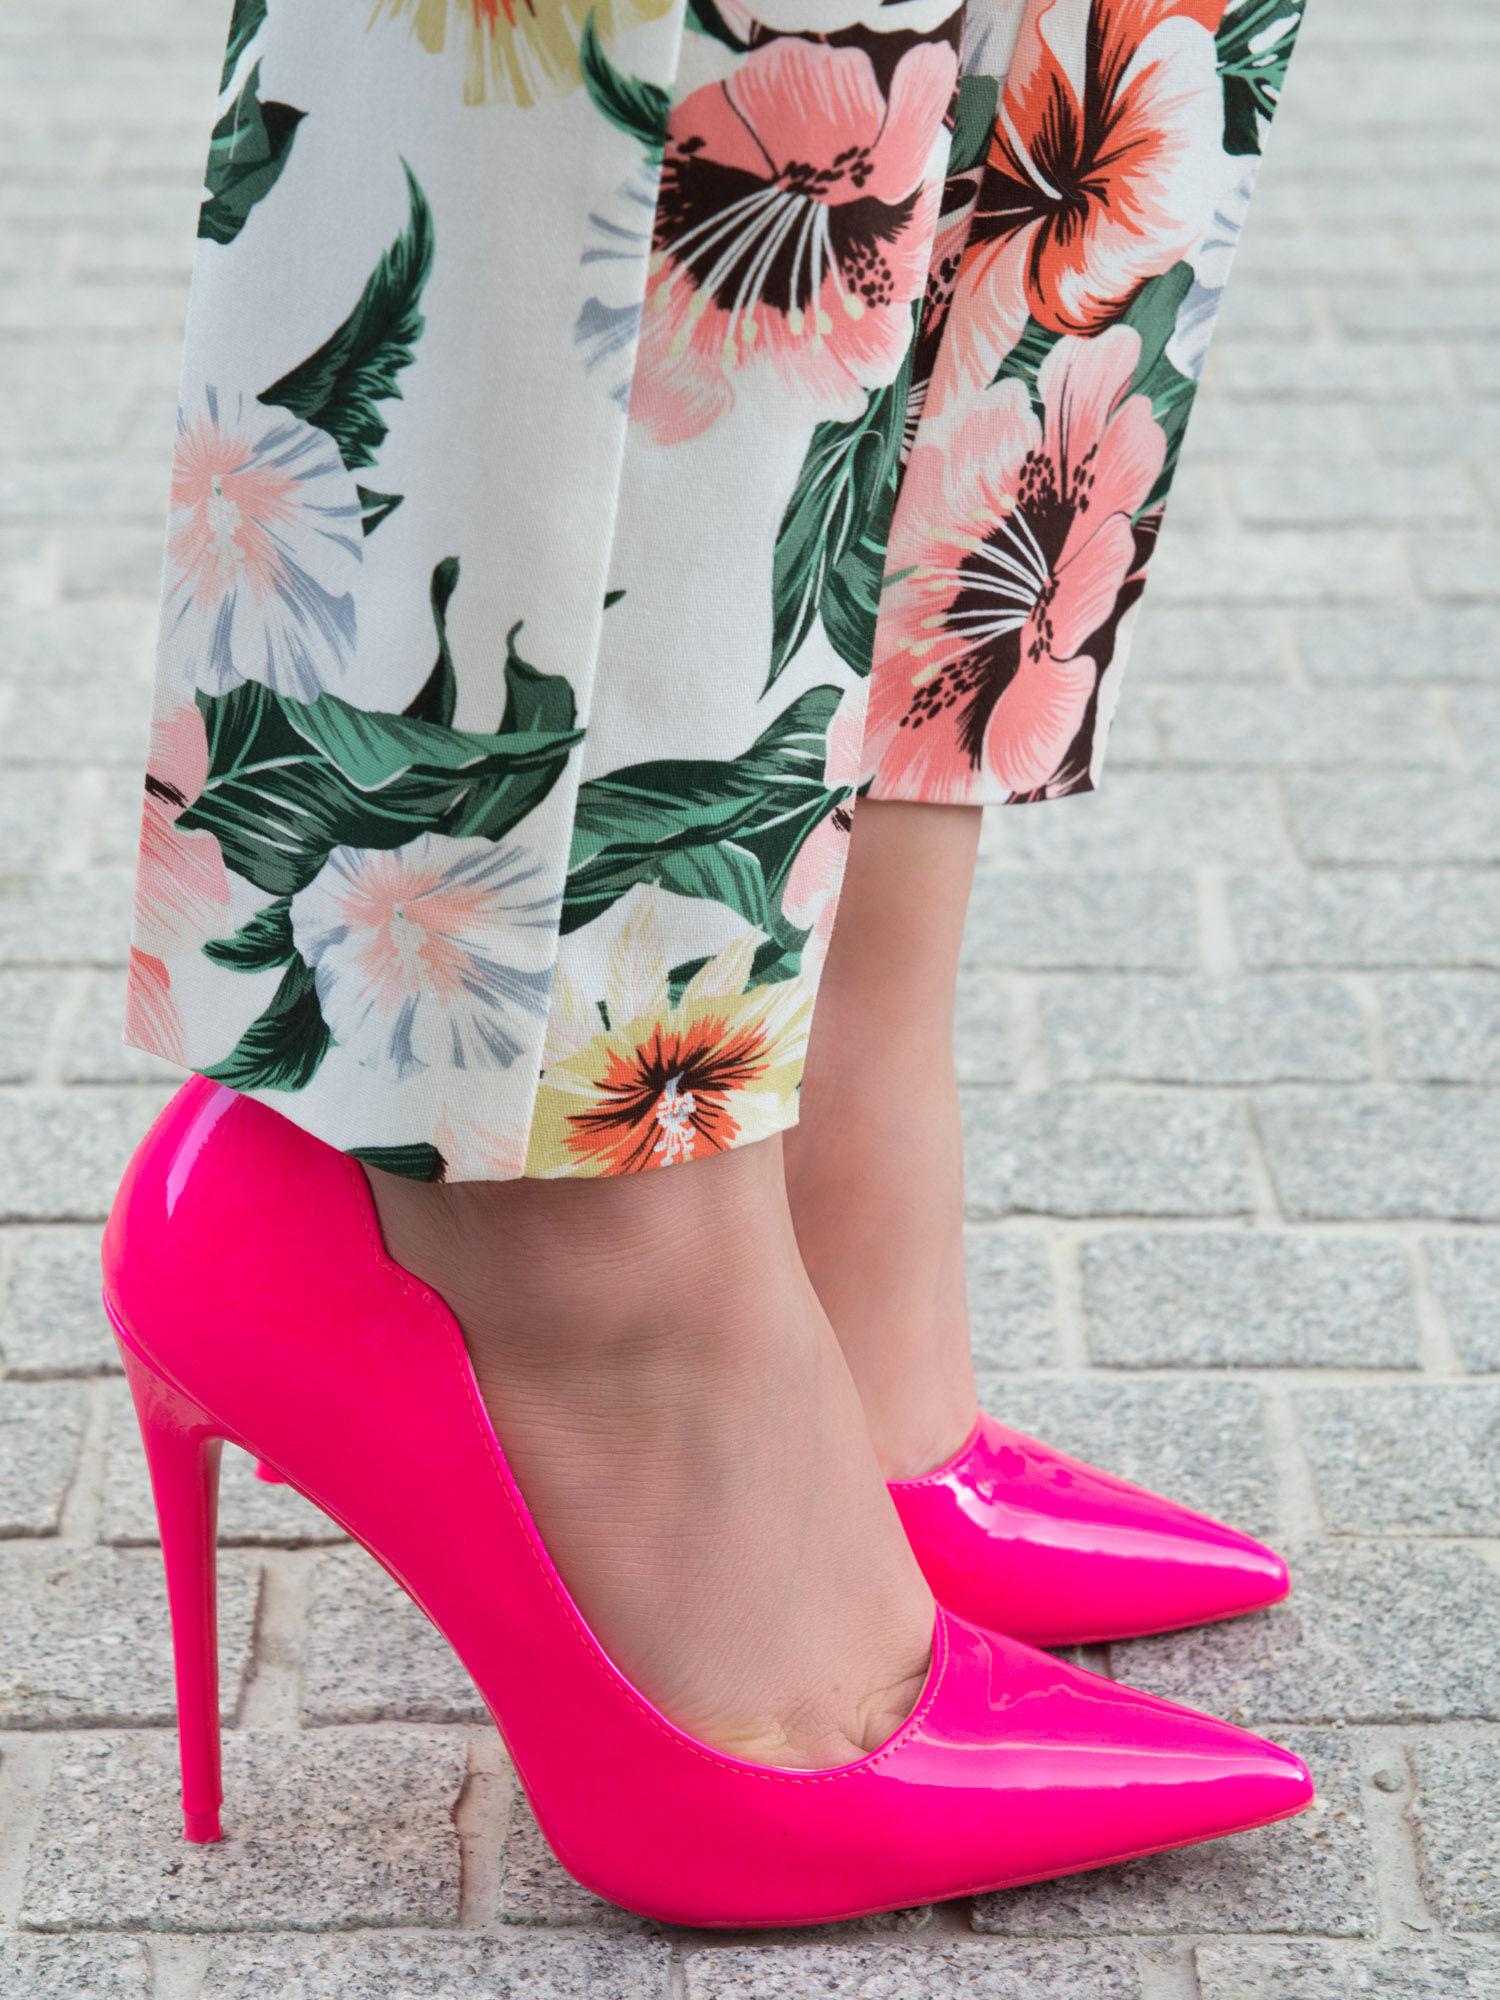 modne buty na obcasie